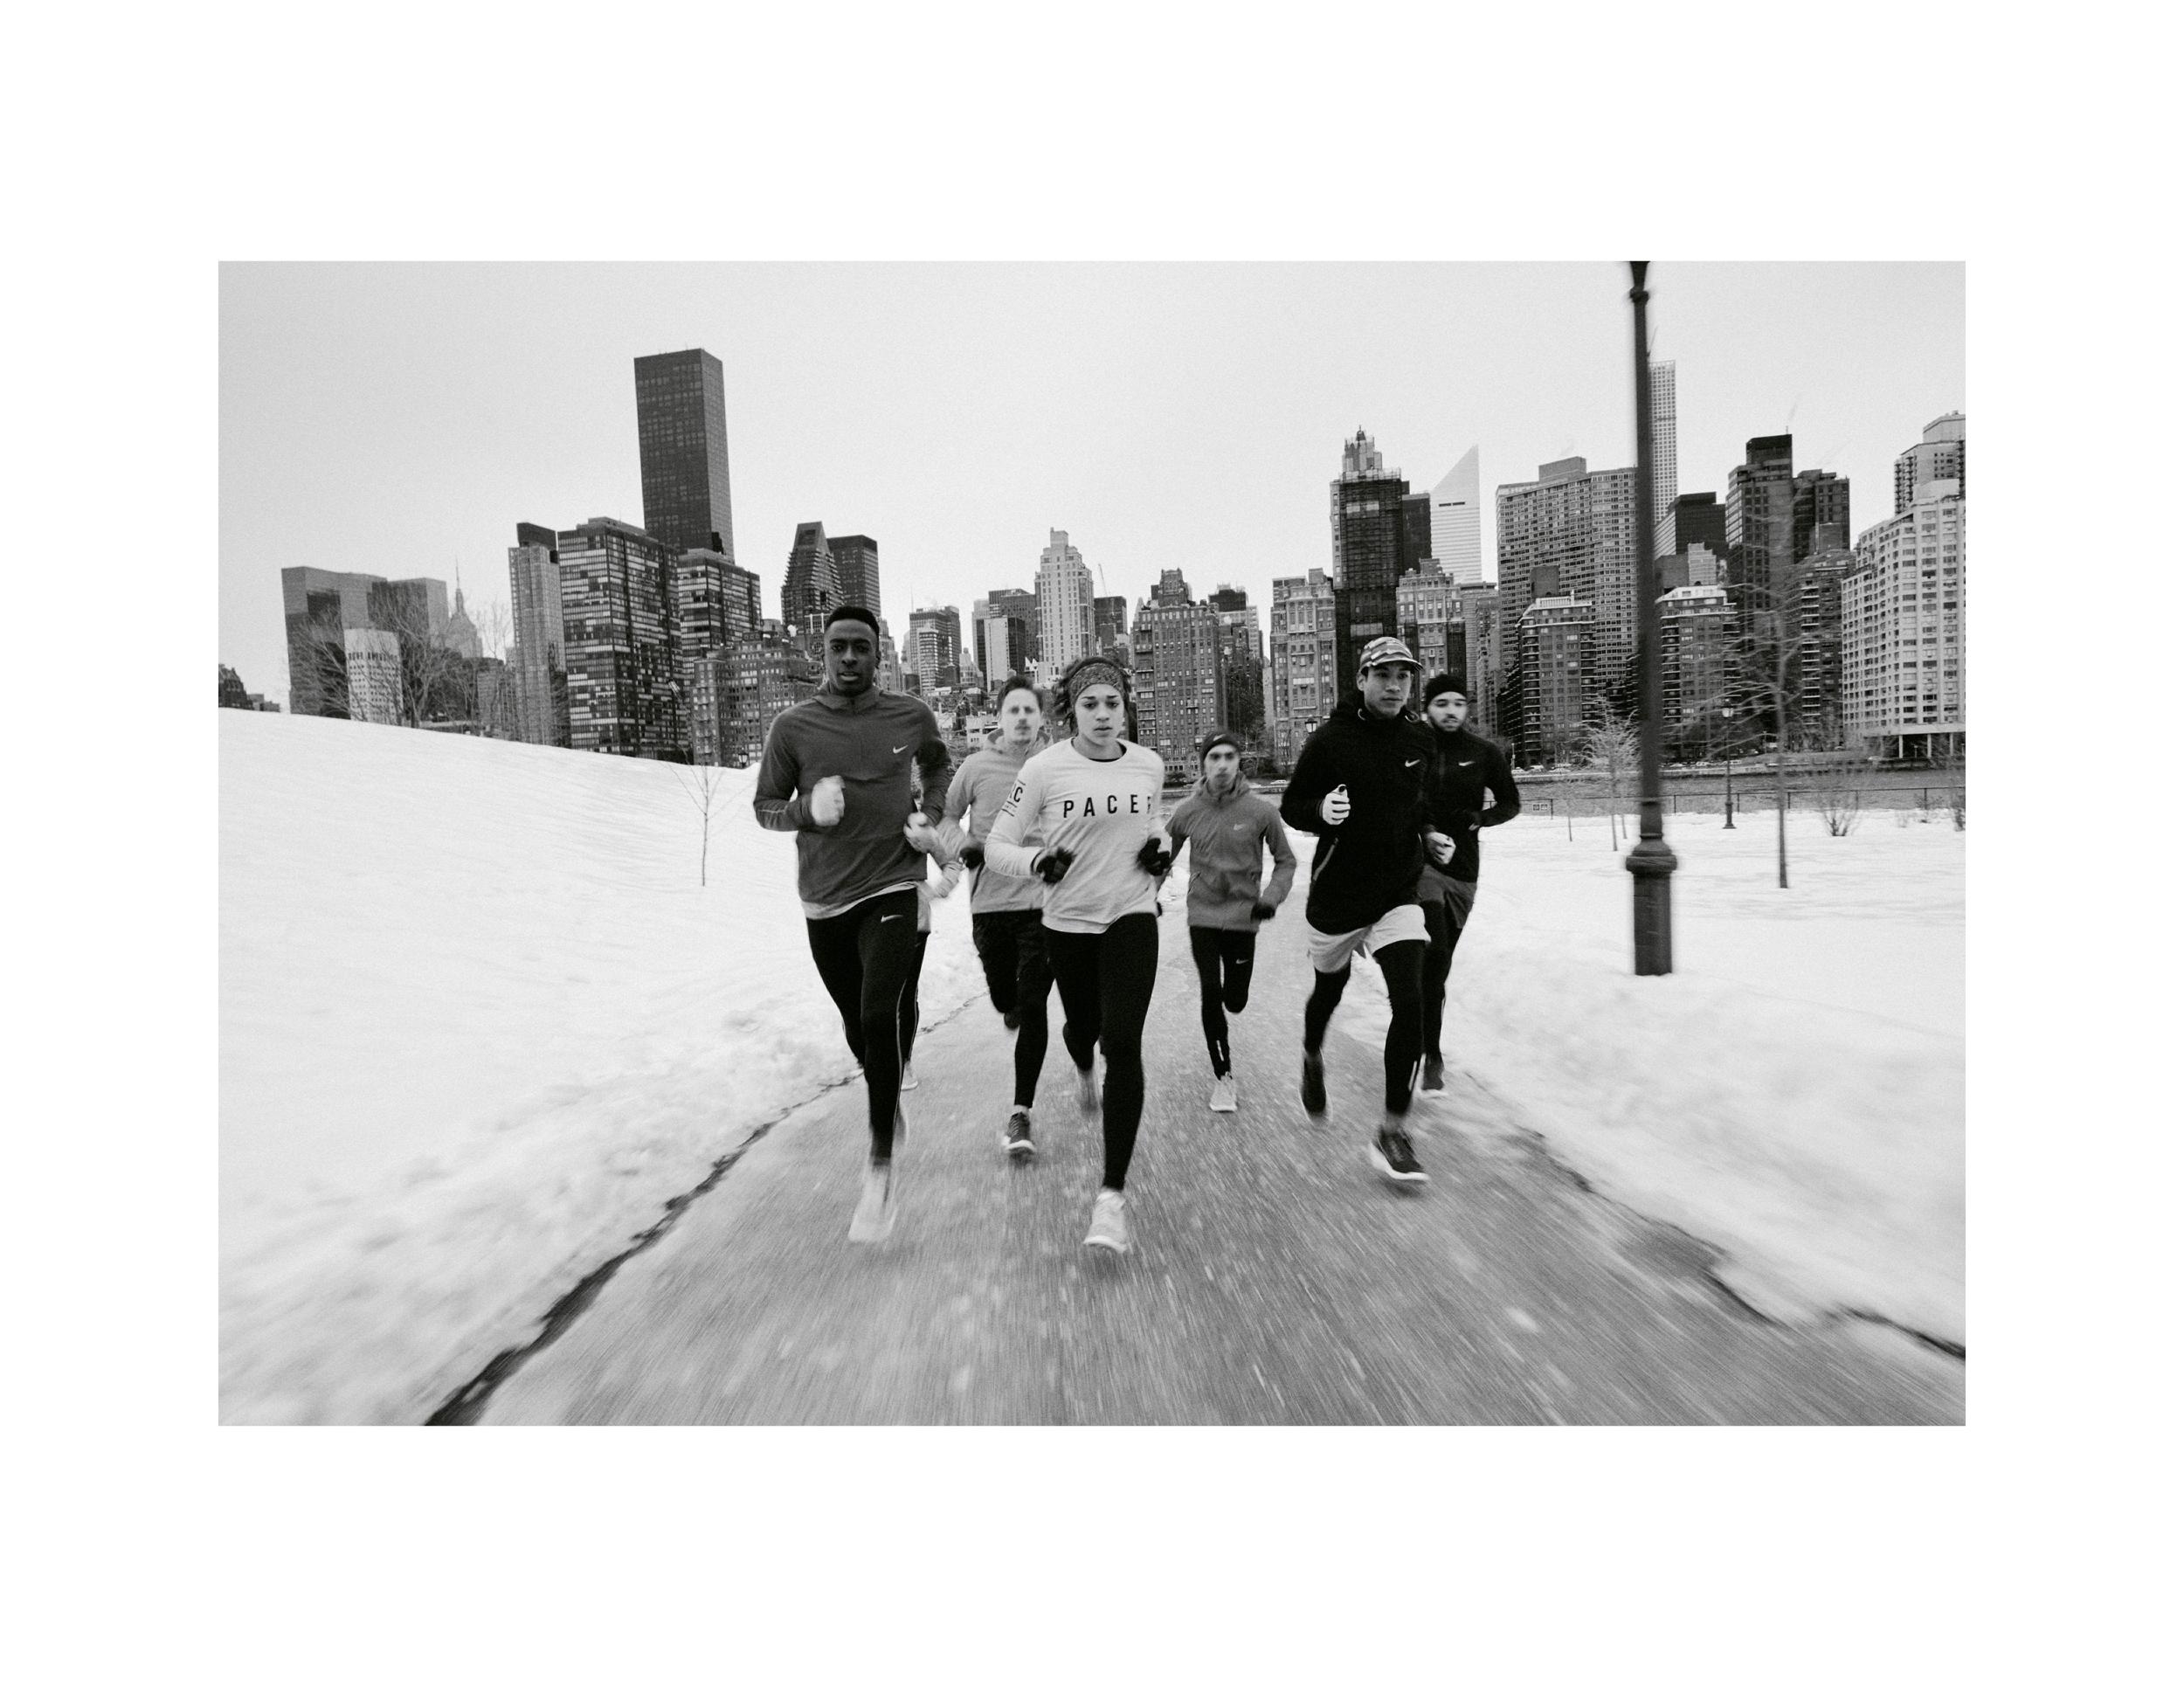 NikeLunarTempo_Slide5.jpg